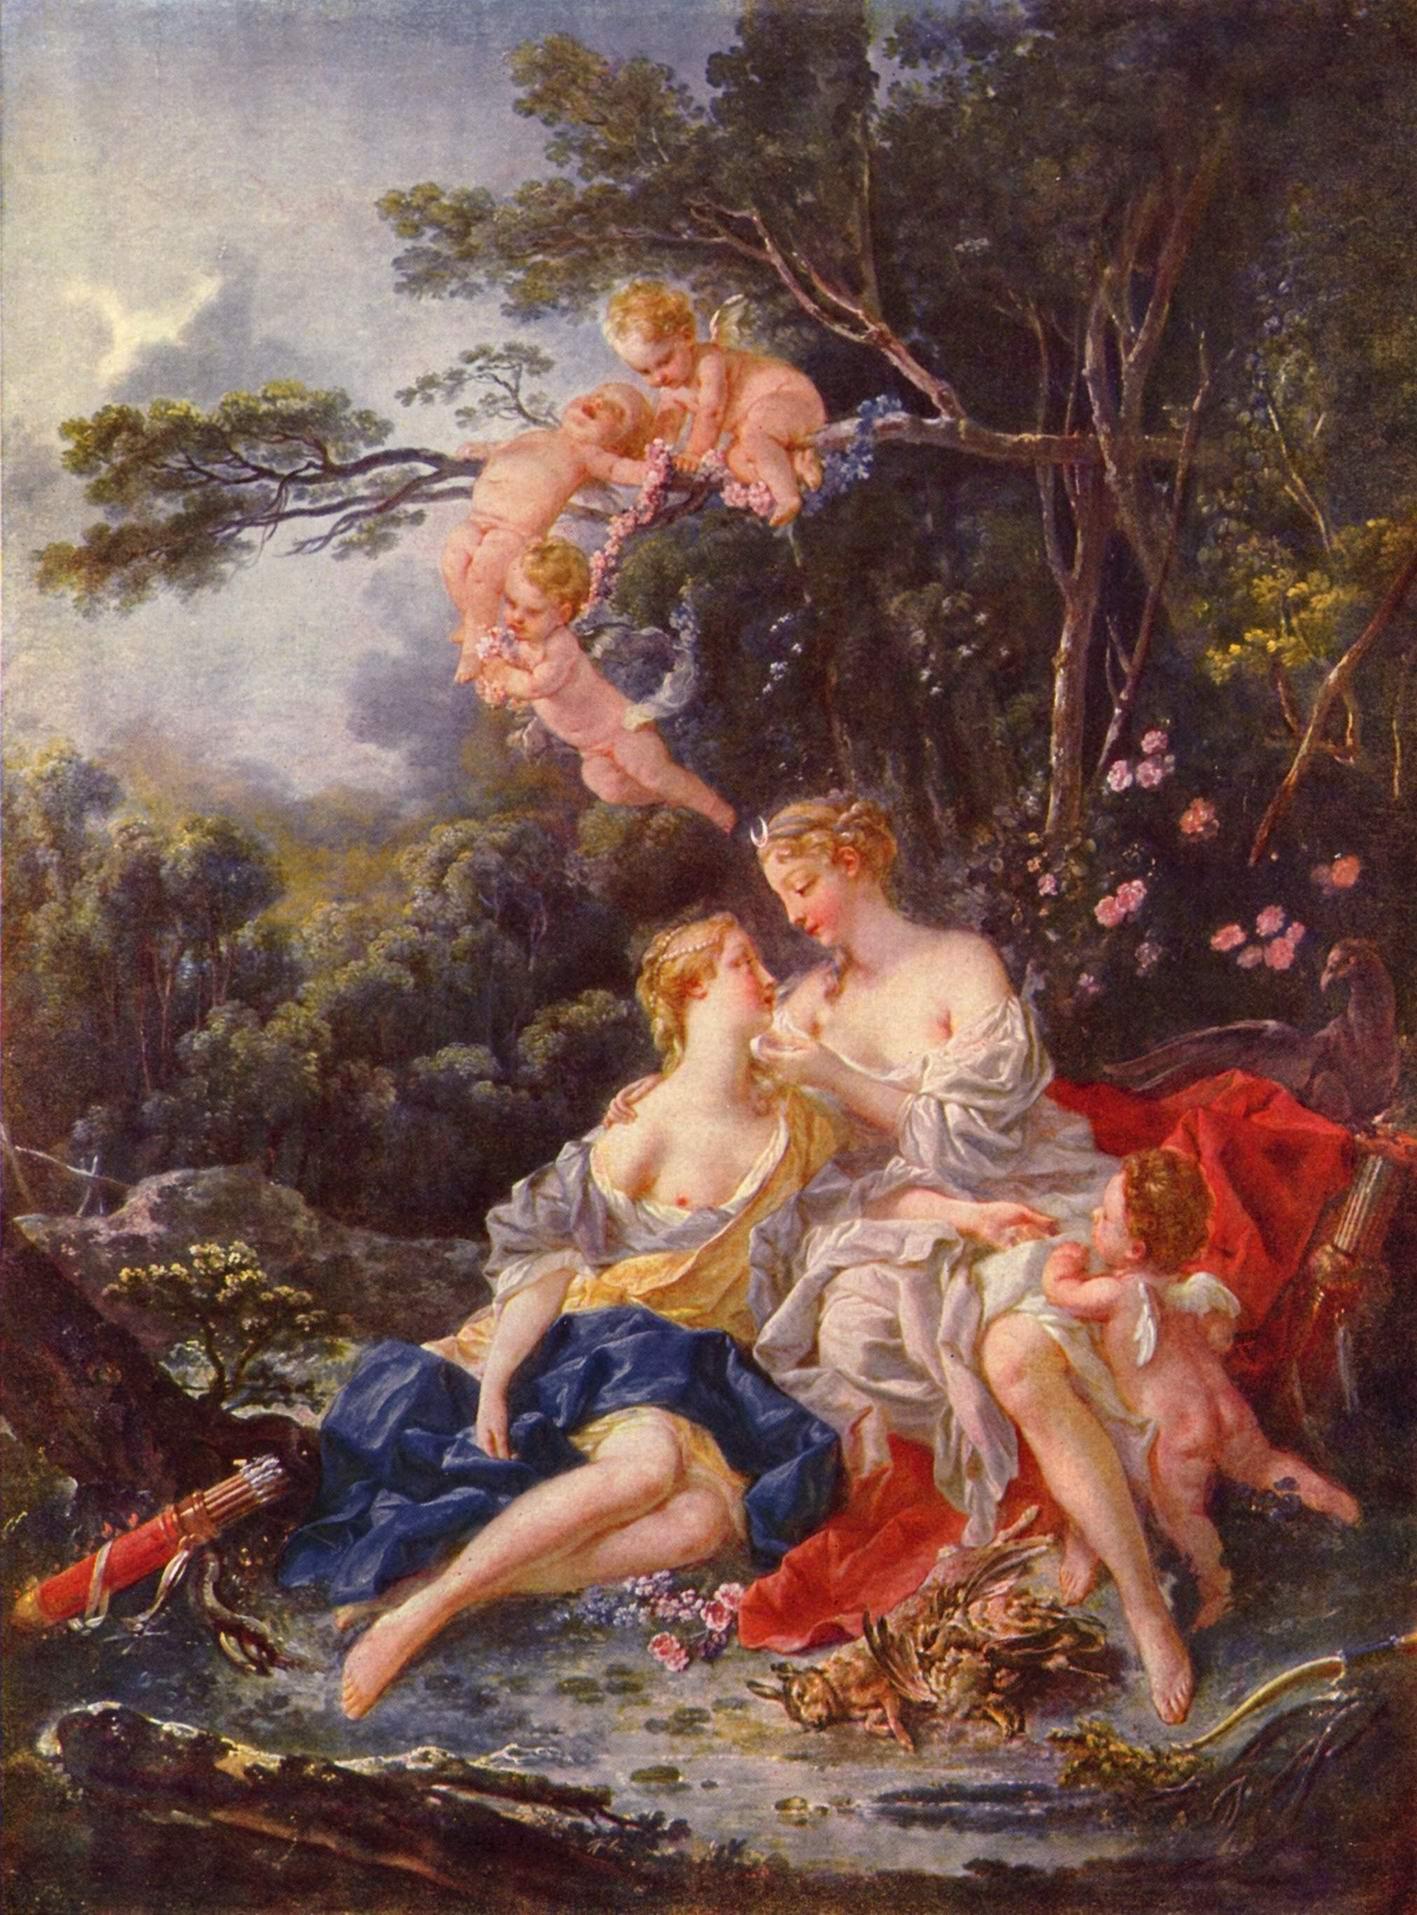 Юпитер и Каллисто, Франсуа Буше